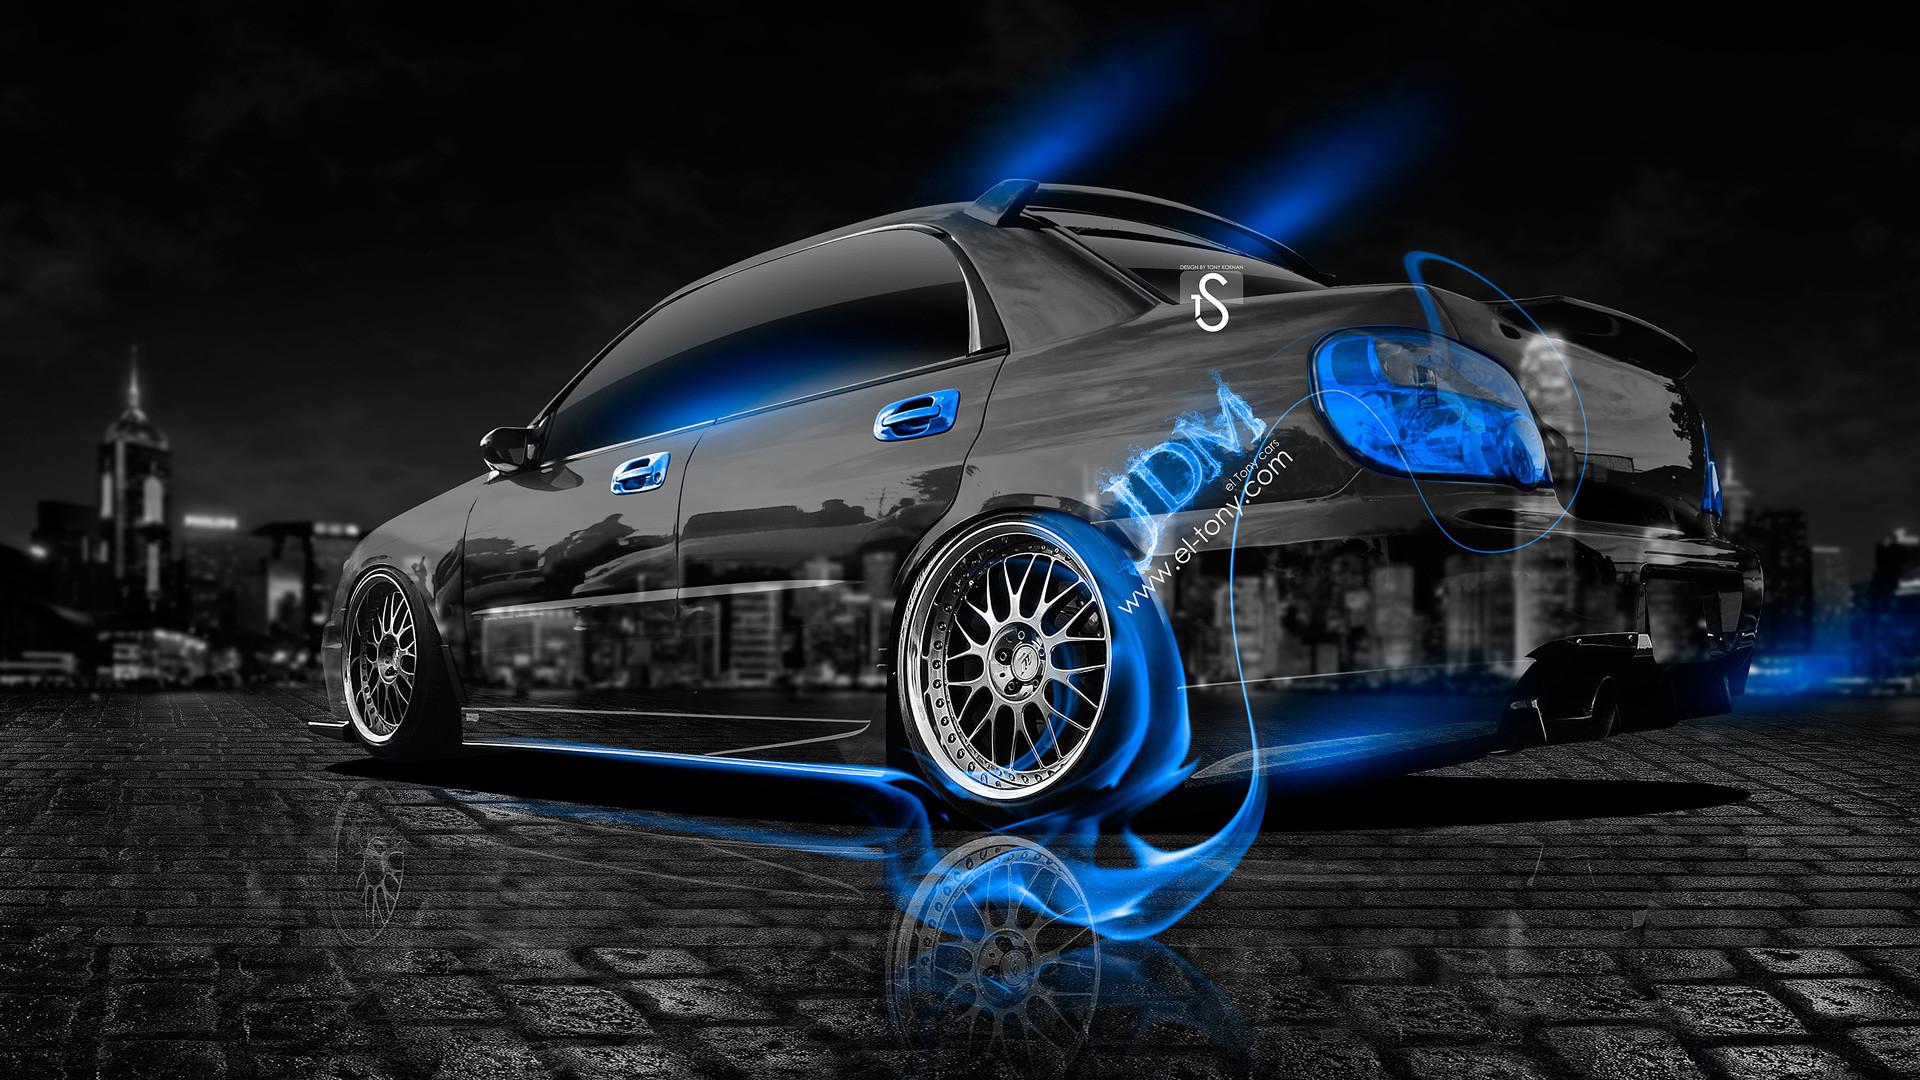 1920x1080 Wallpaper Subaru Impreza, Wrx Sti, Cars, Style, White 1920x1080.  1920x1080 1920x1080 Wallpaper ...